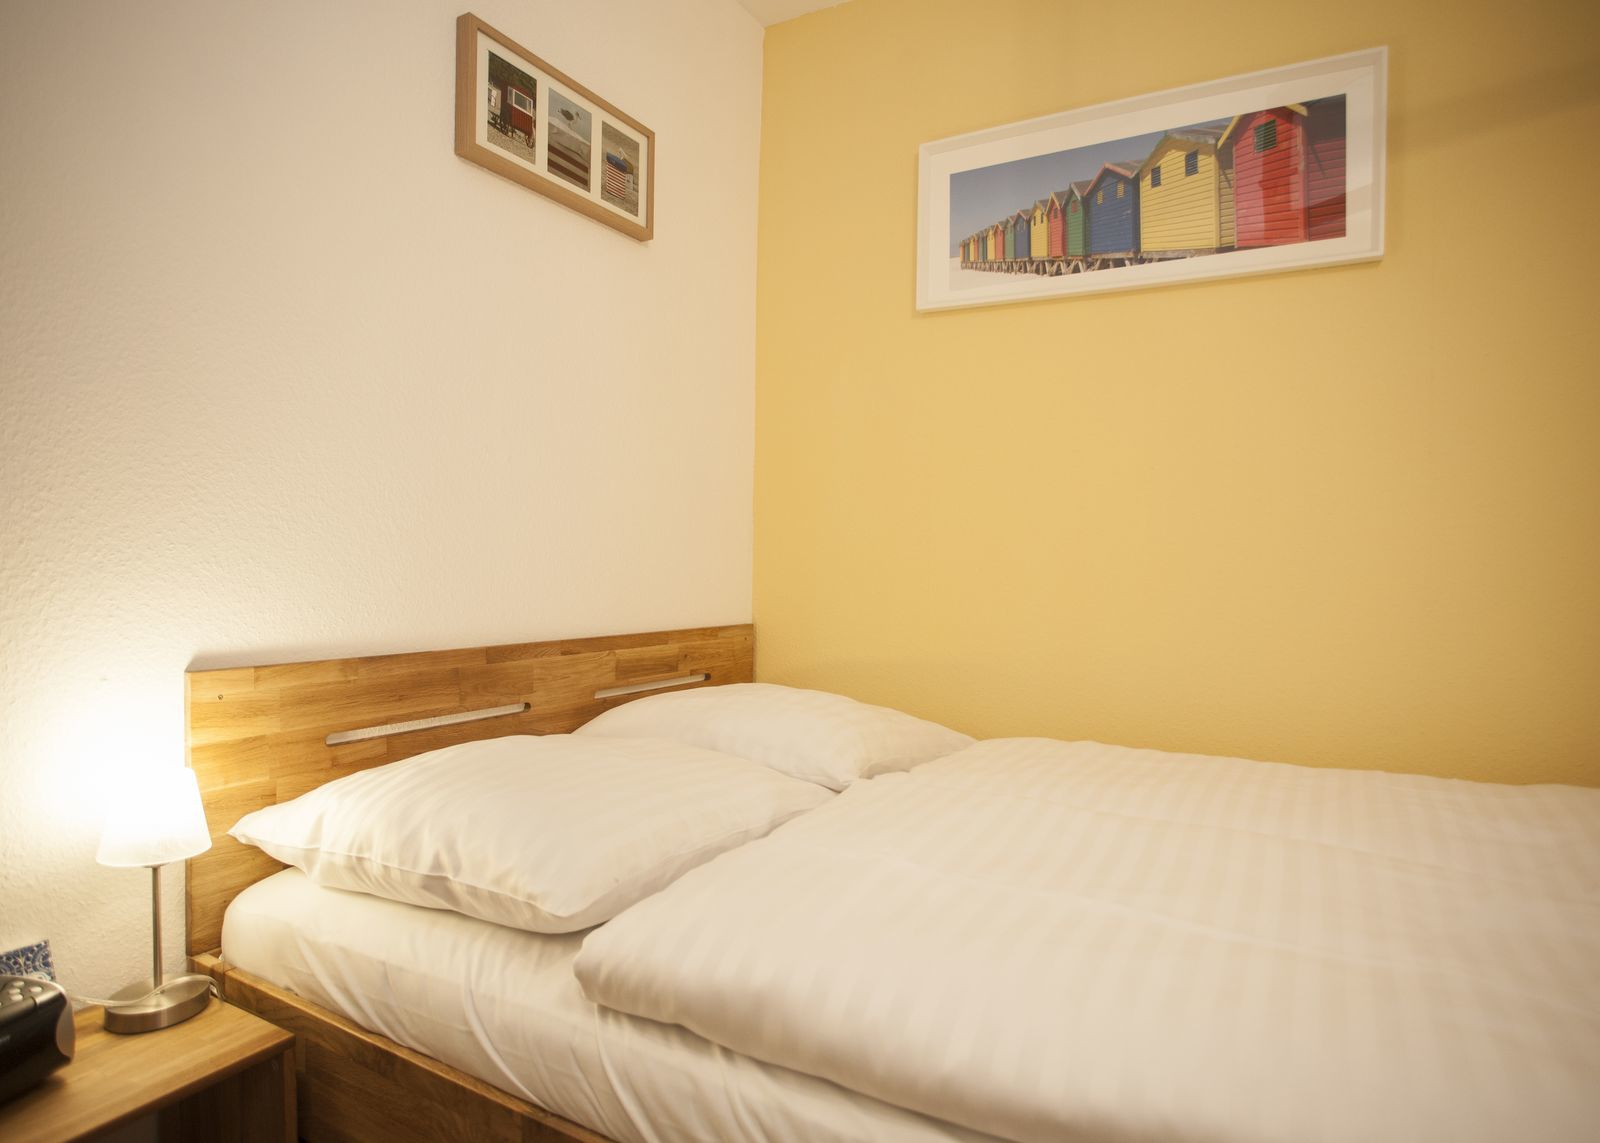 Apartment - Am Waltenberg 47-R